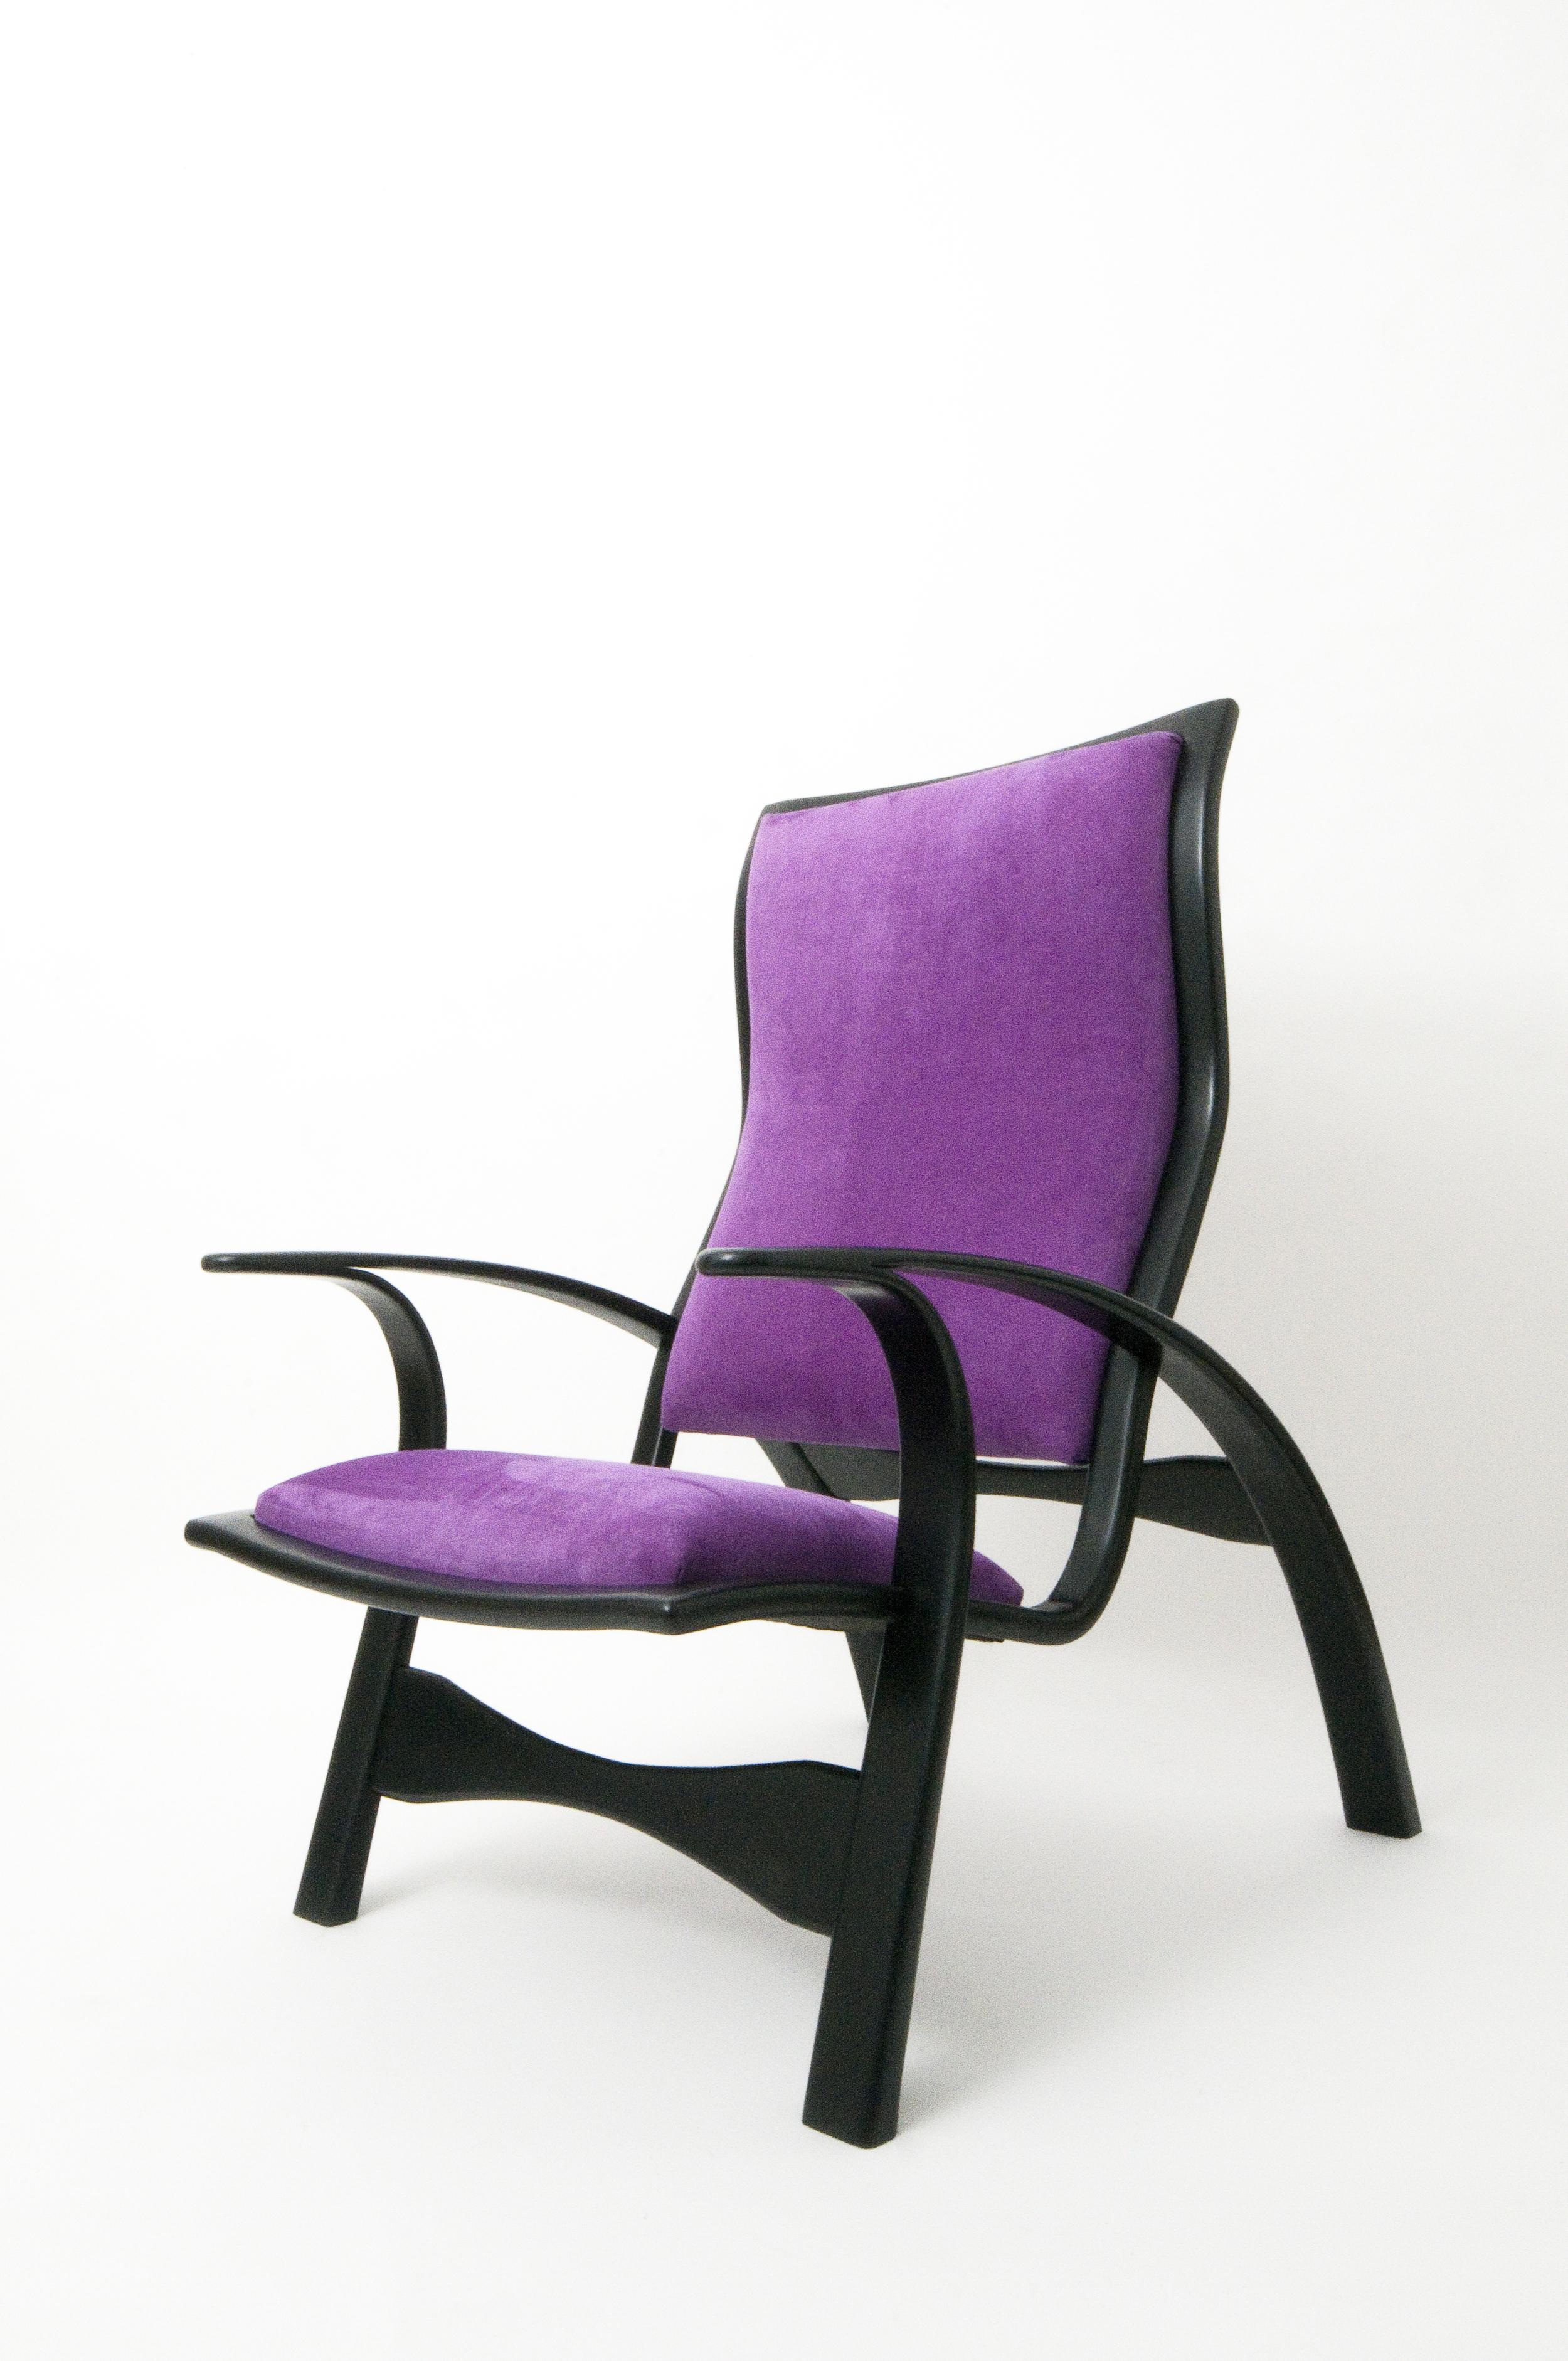 Crown royal chair2.jpg